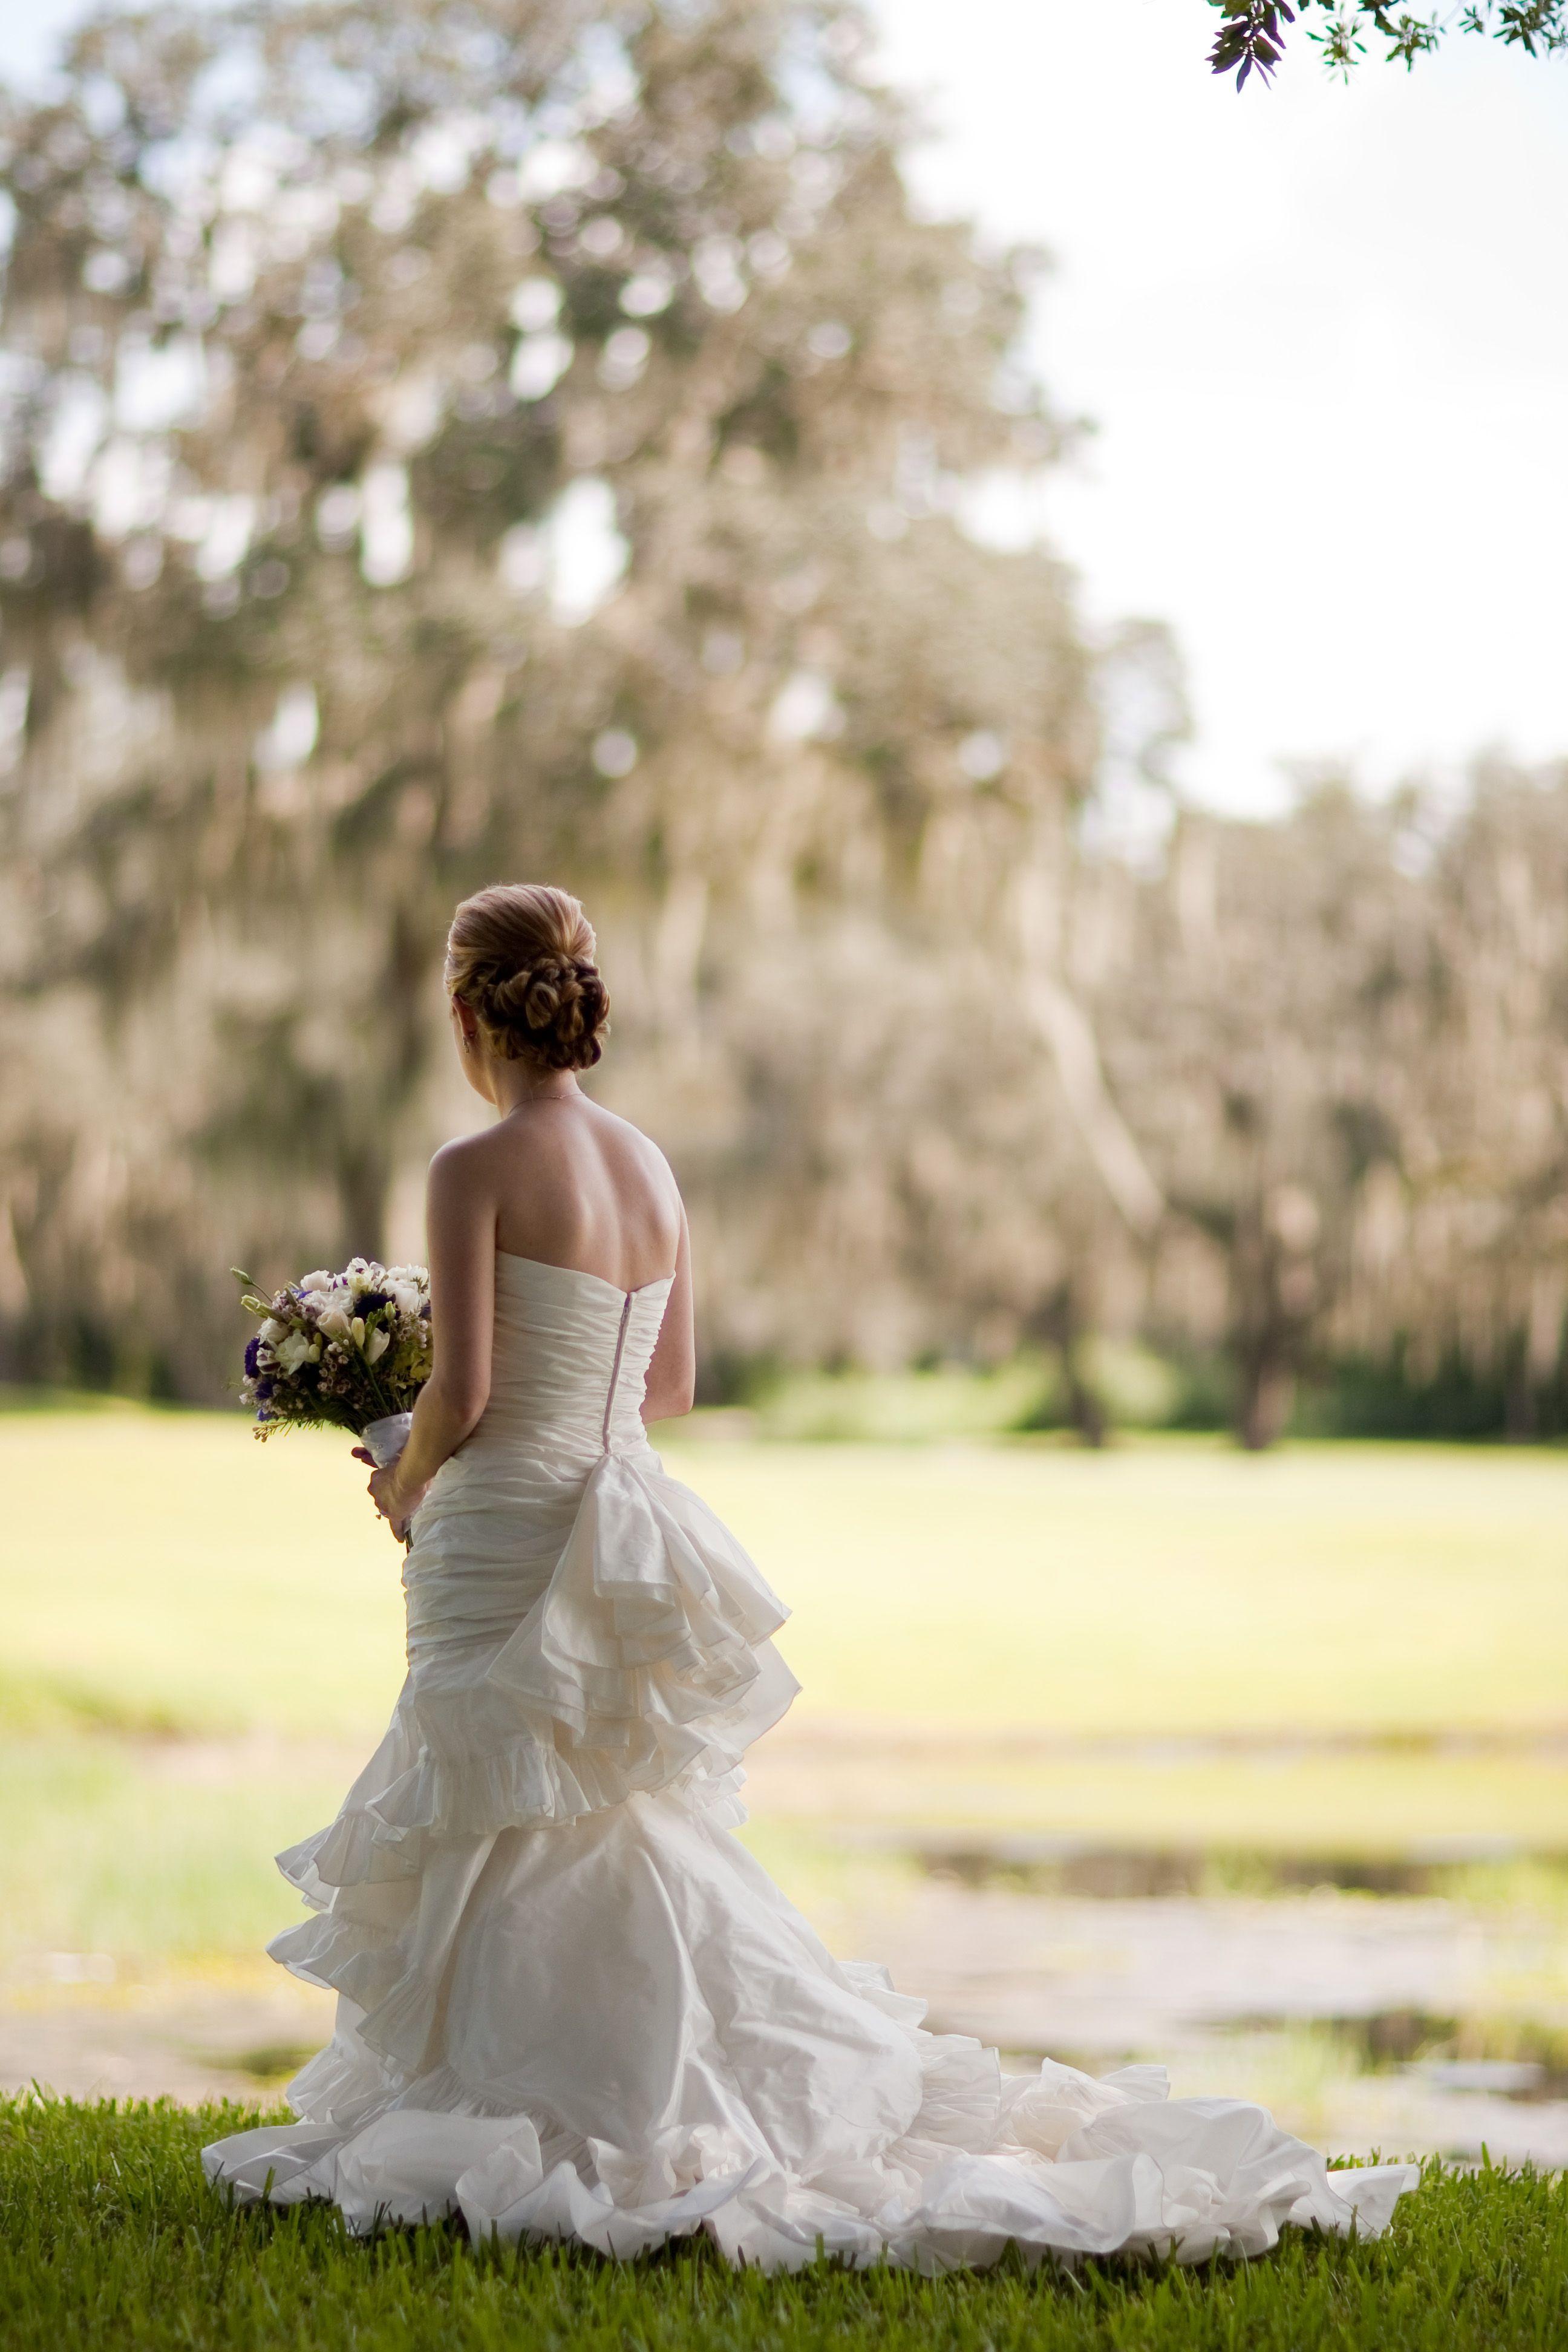 Bustle, Victorian Style wedding dress. Victorian gothic